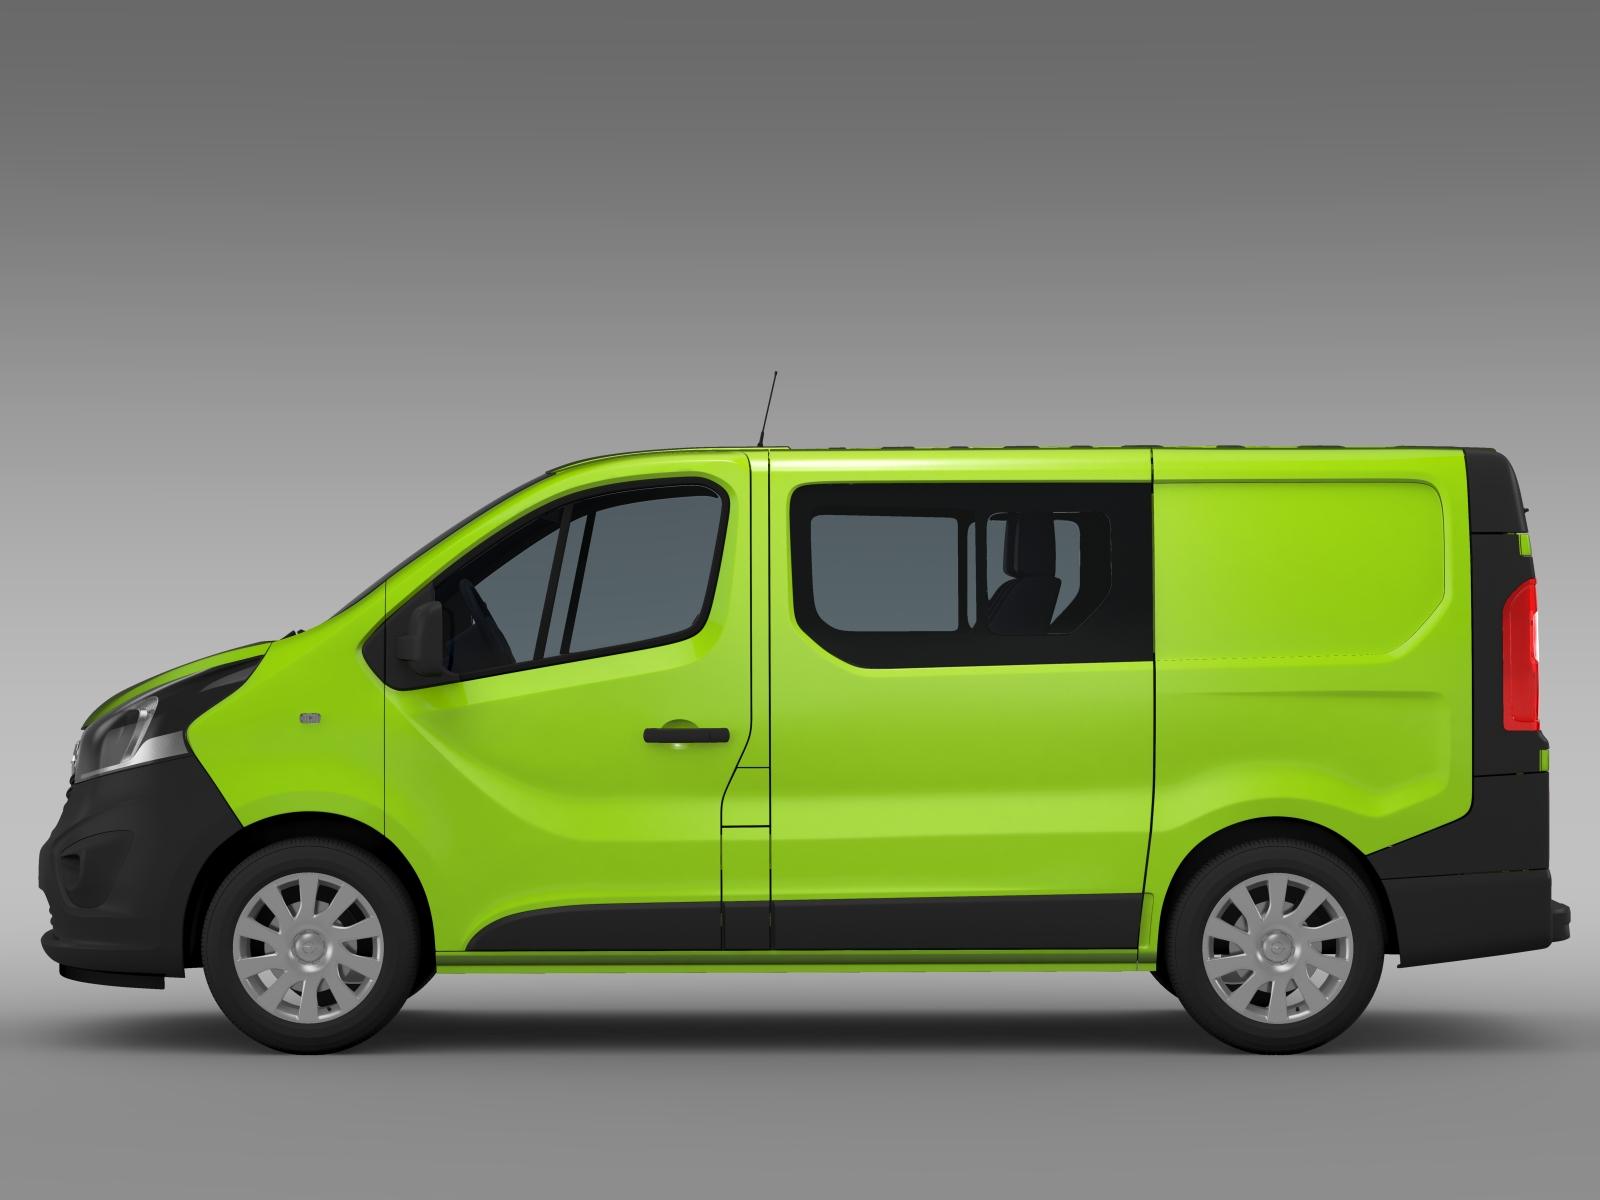 opel vivaro multivan ecoflex 2015 vehicles on creative market. Black Bedroom Furniture Sets. Home Design Ideas